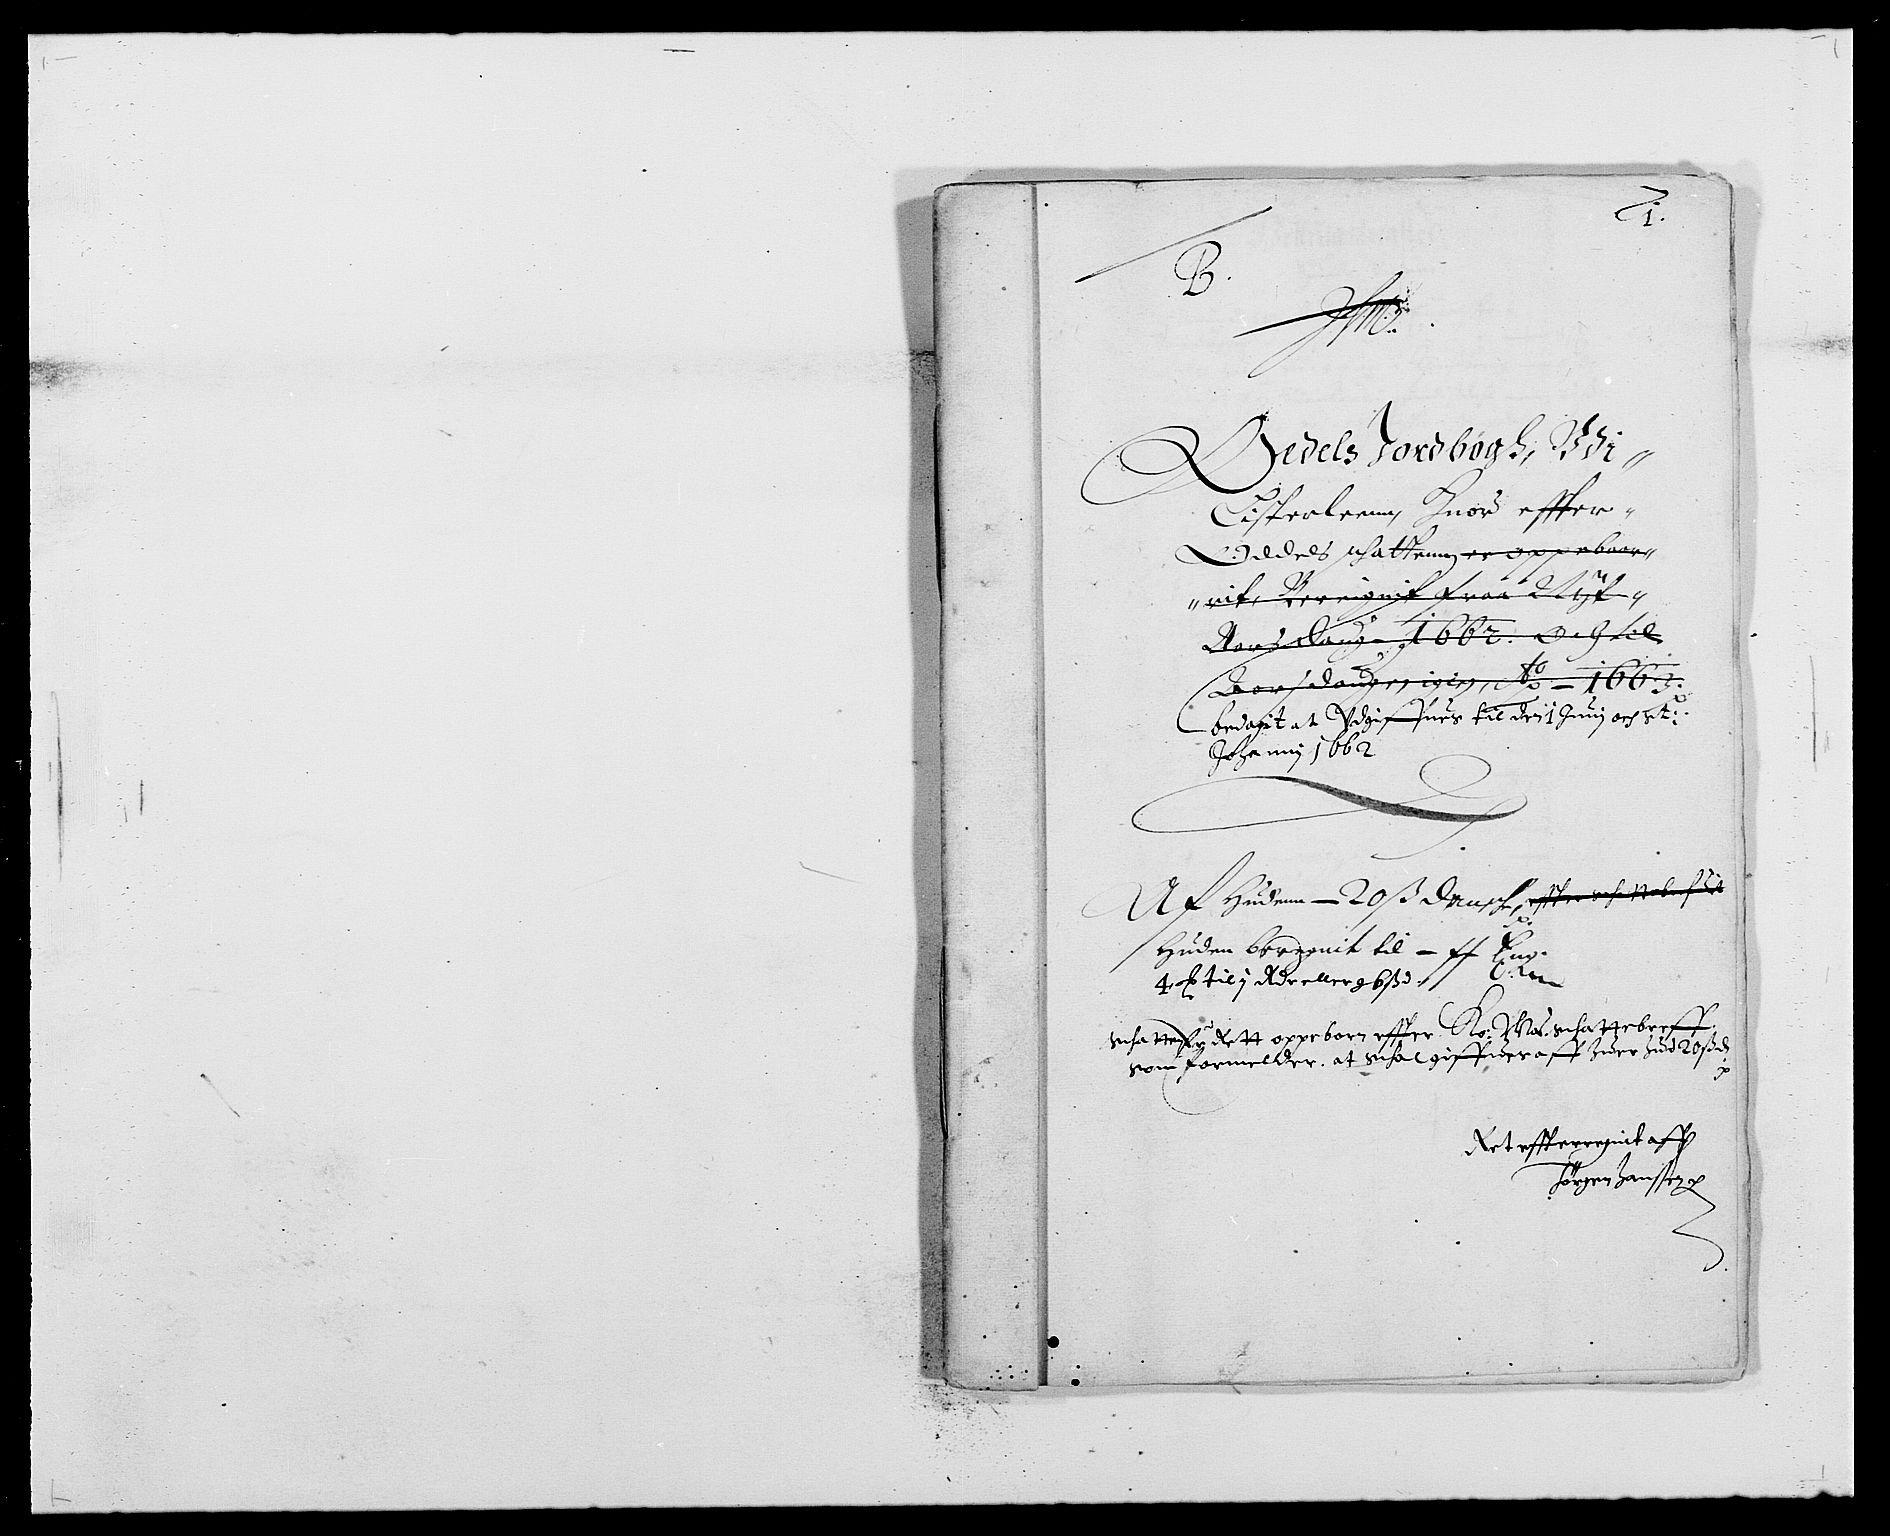 RA, Rentekammeret inntil 1814, Reviderte regnskaper, Fogderegnskap, R41/L2522: Fogderegnskap Lista, 1662, s. 297